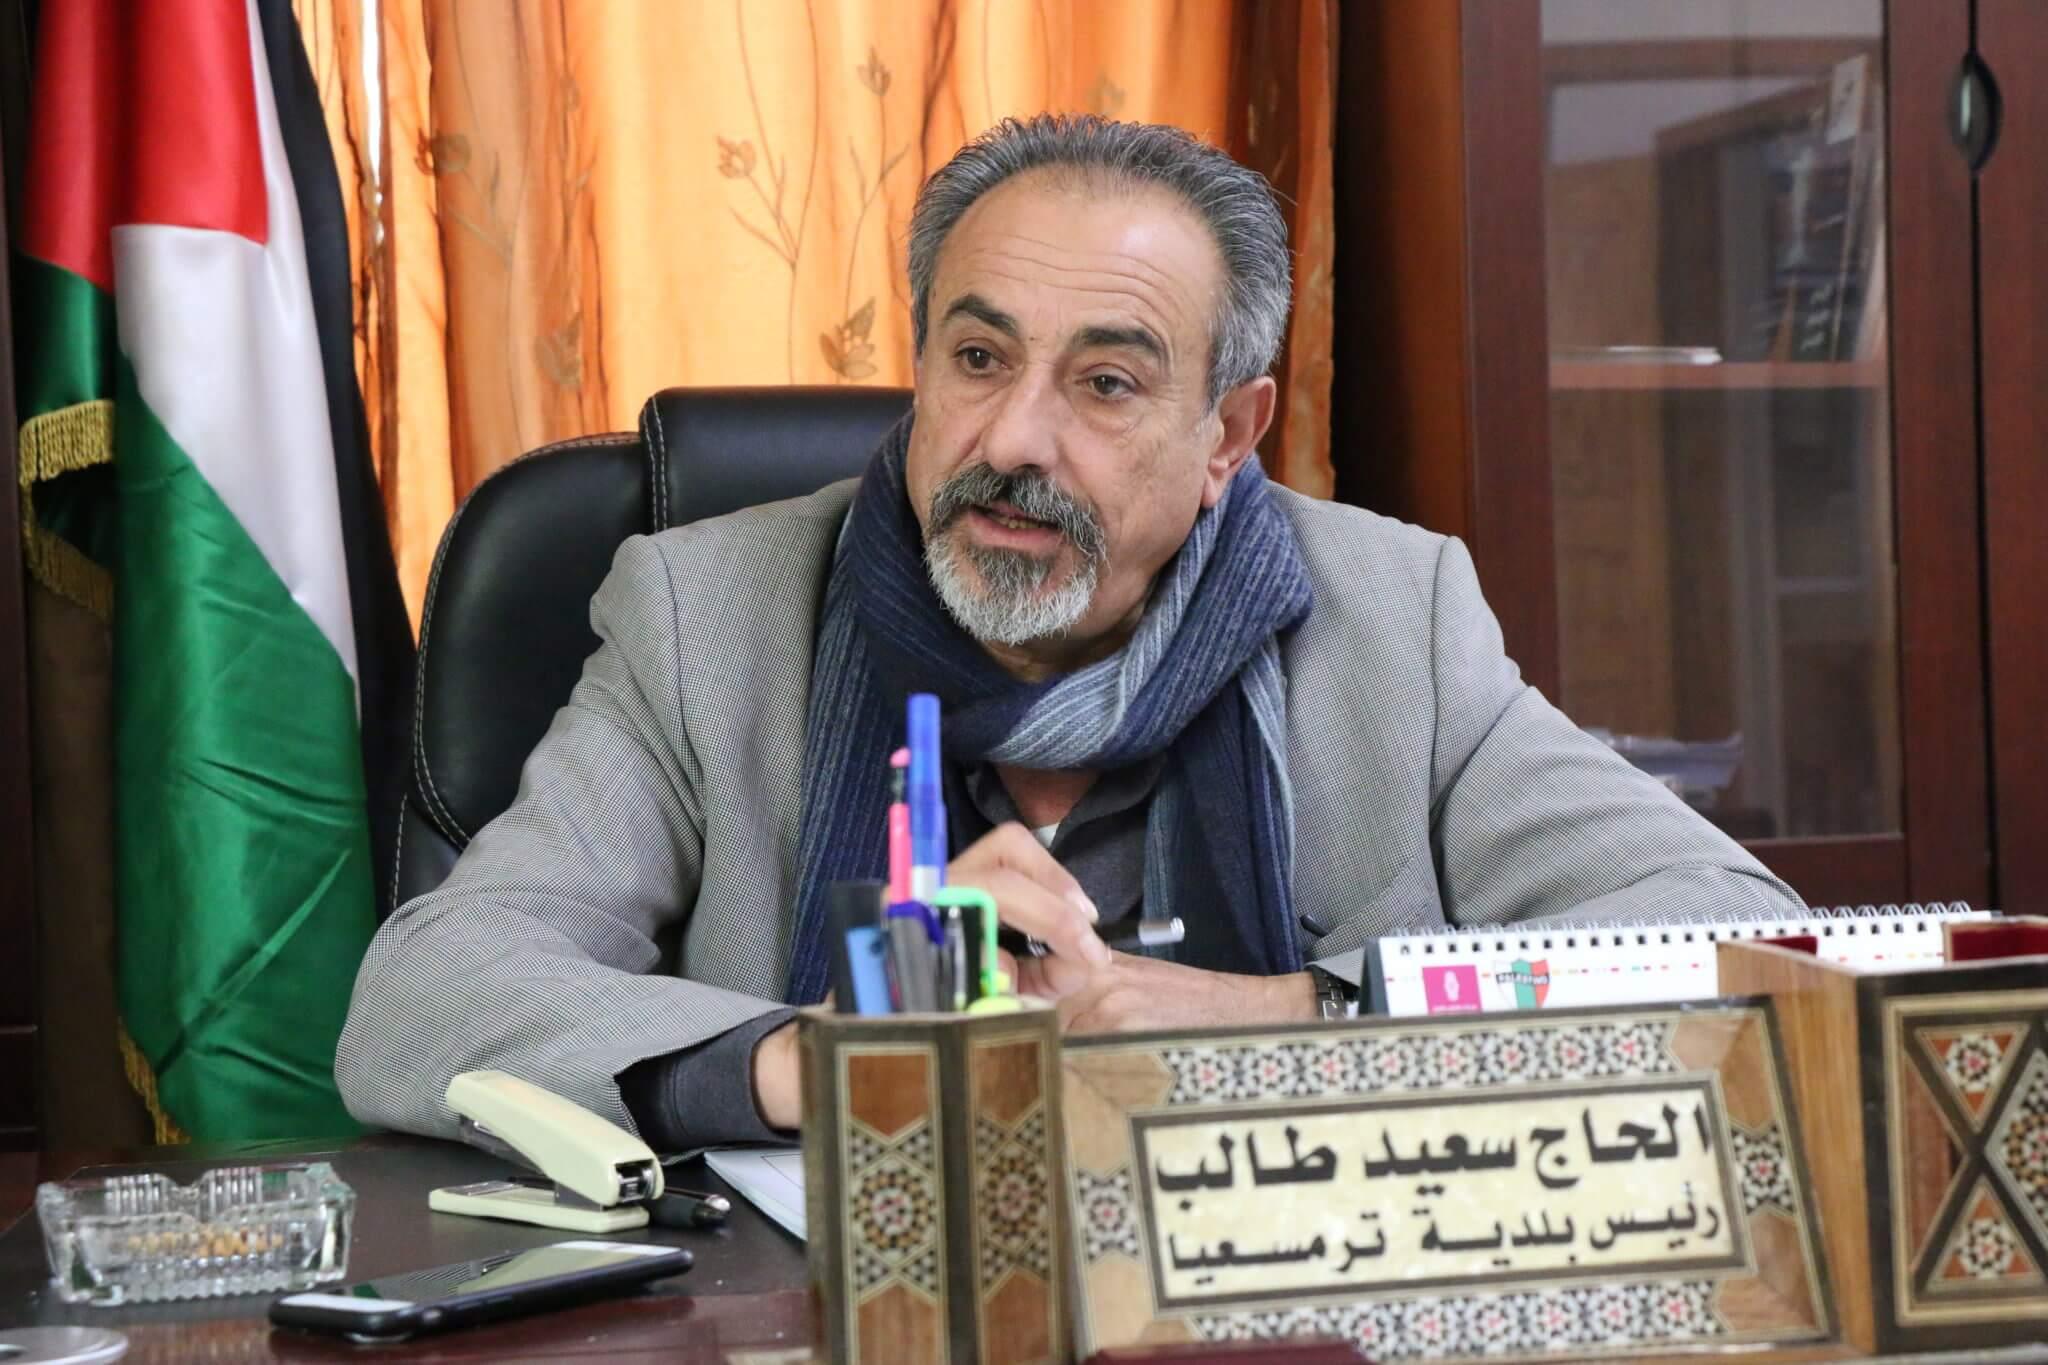 Saeed Hussein, the mayor of Turmus Ayya. (Photo: Yumna Patel)